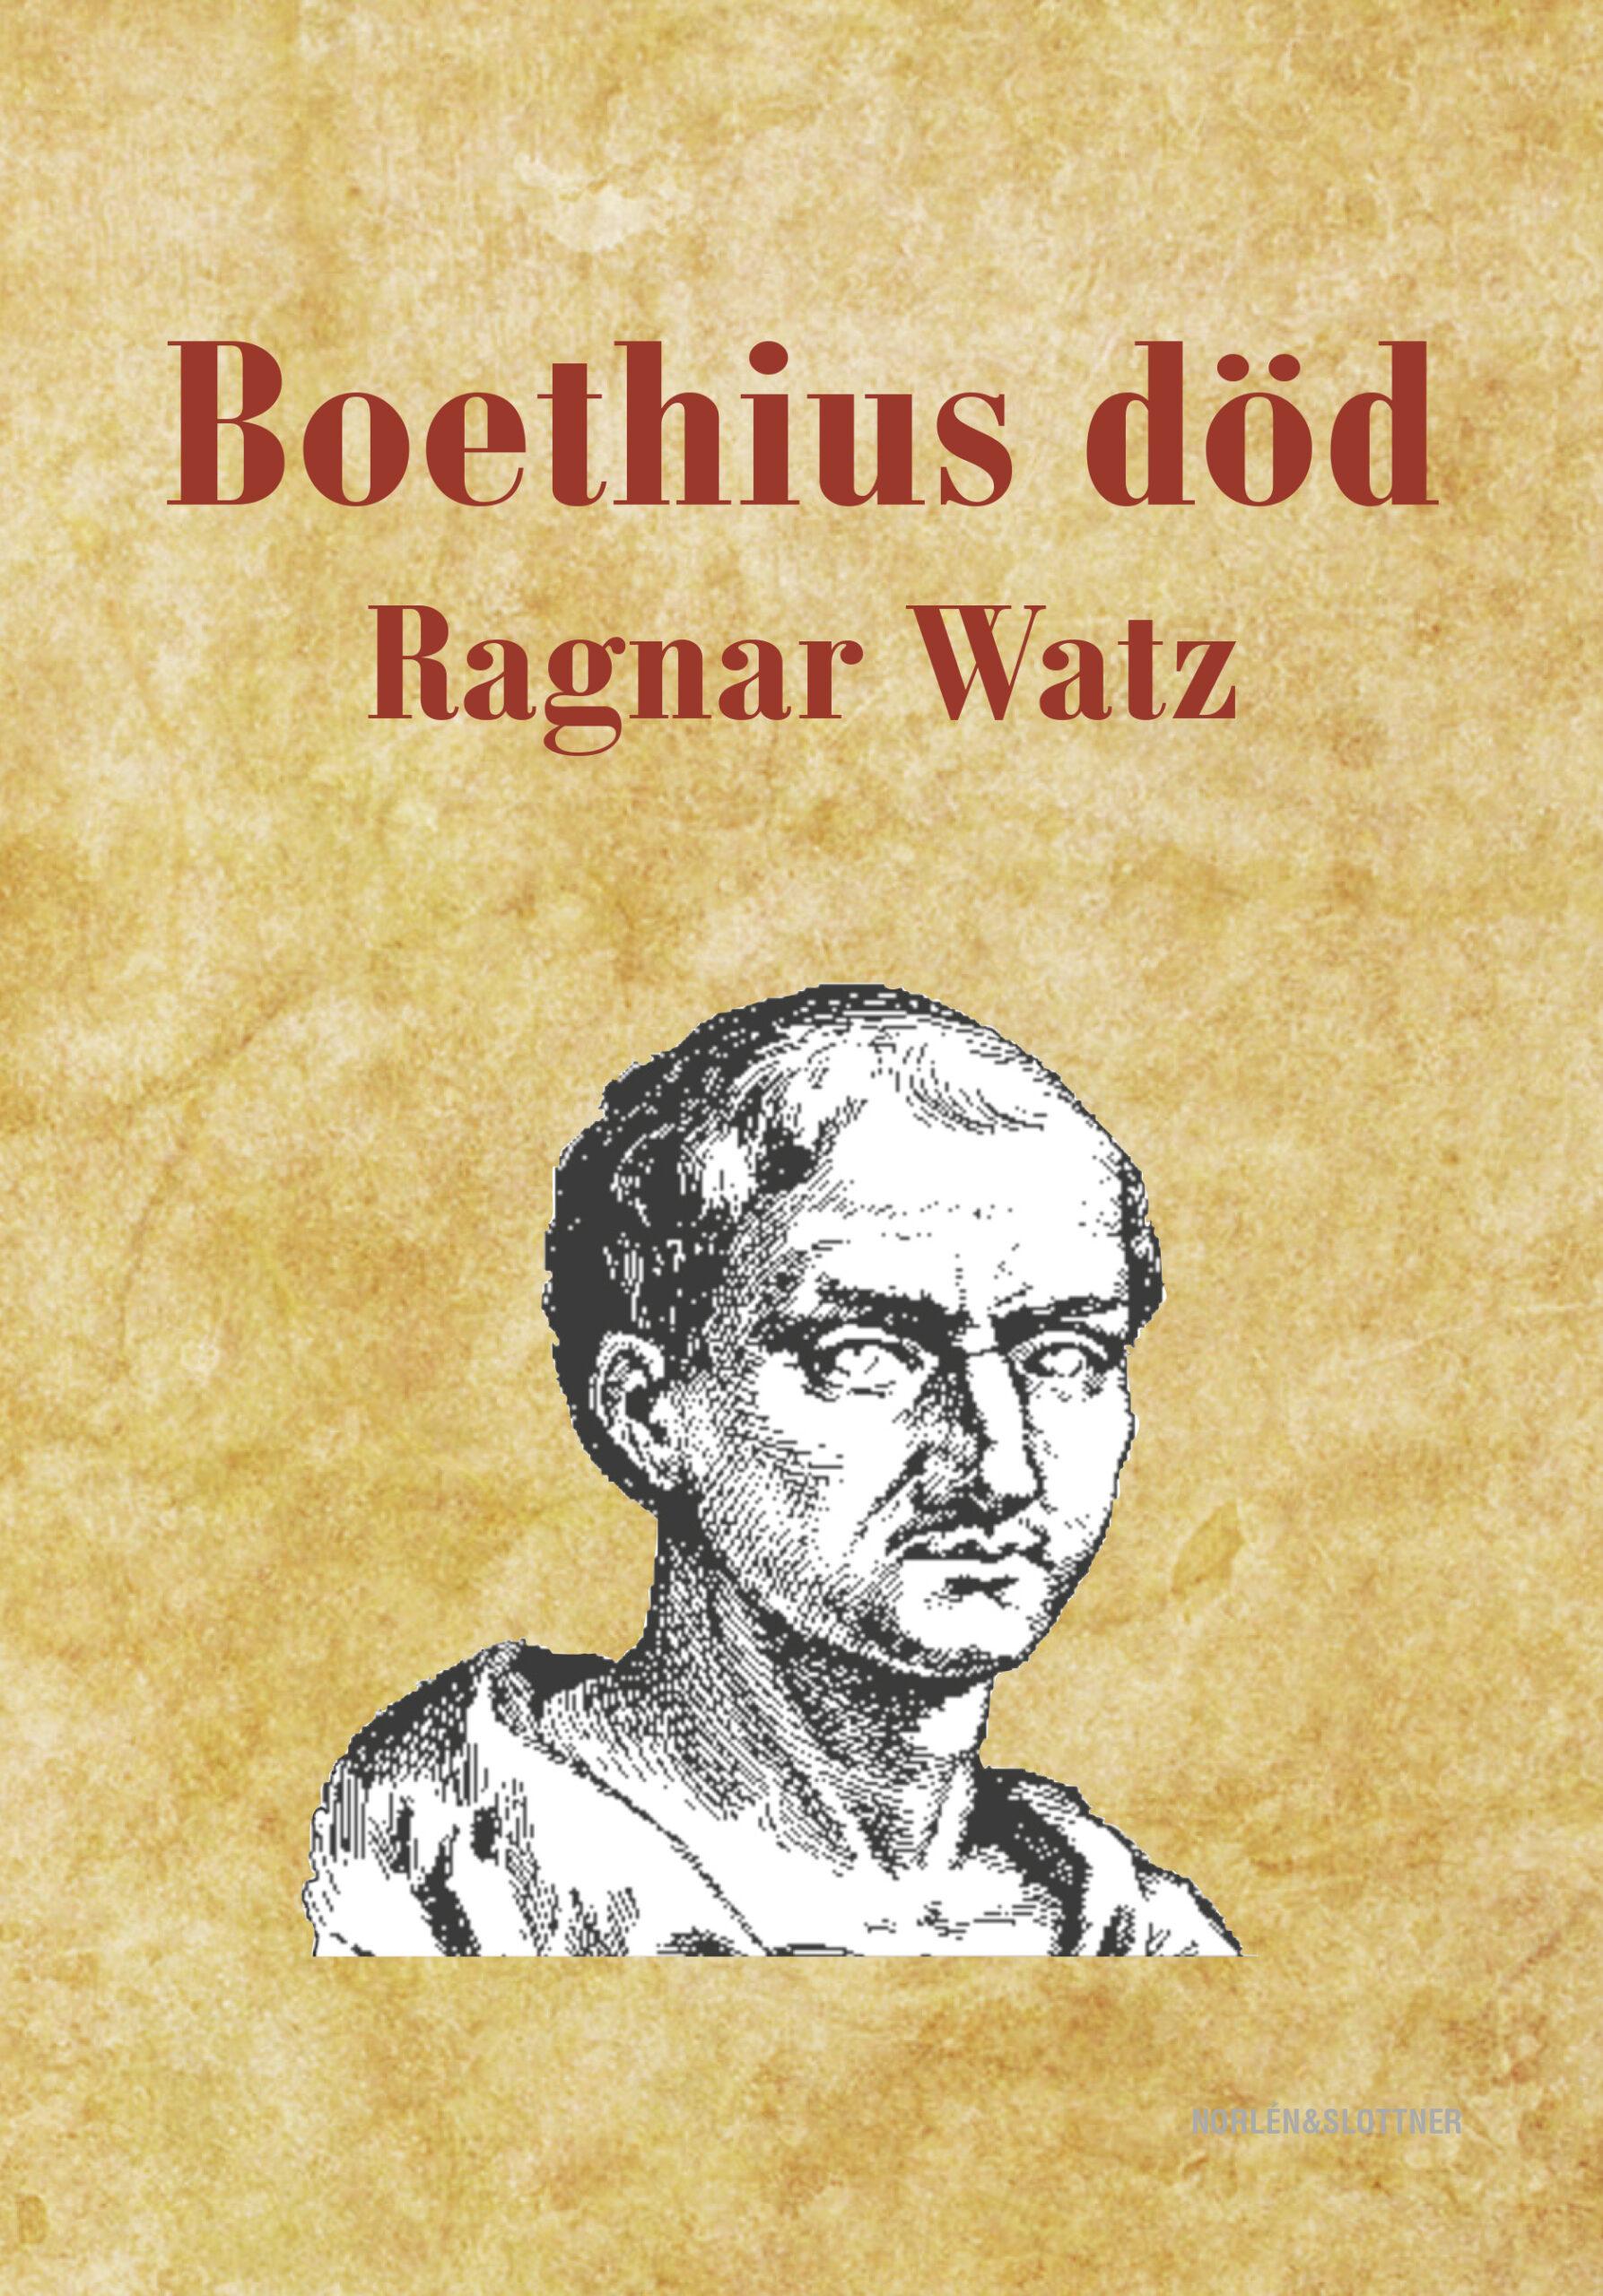 Boethius_omslag